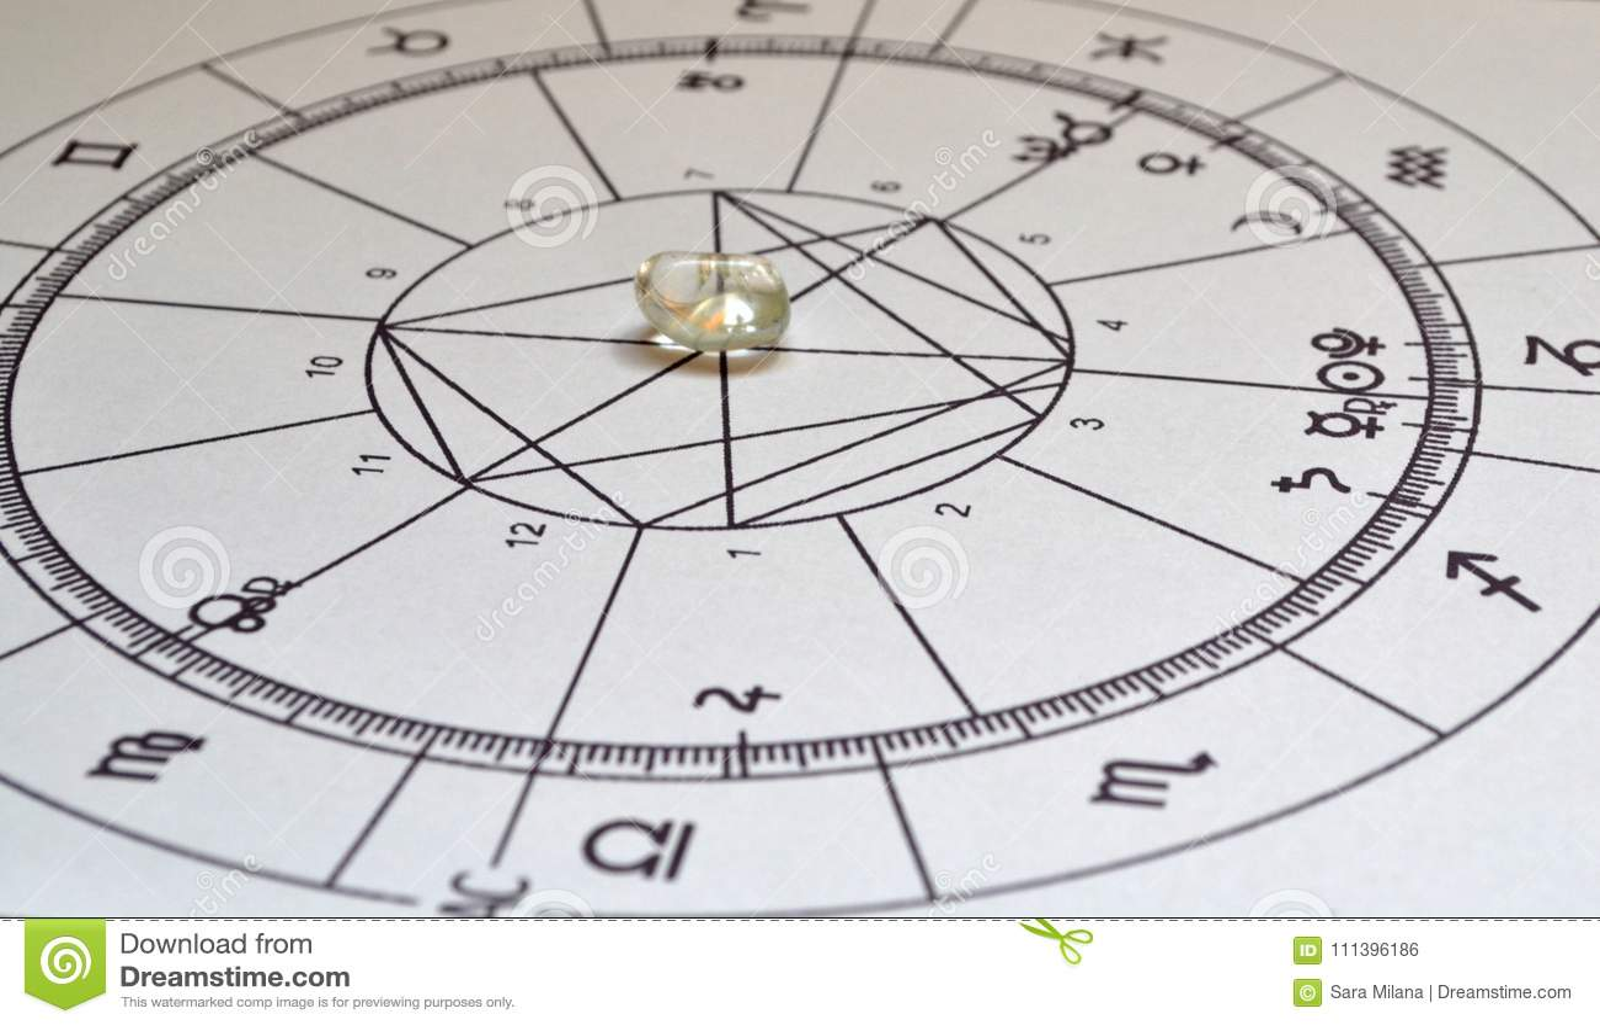 Astrology chart Angel Aura Quartz Natural stone Crystal Natal chart